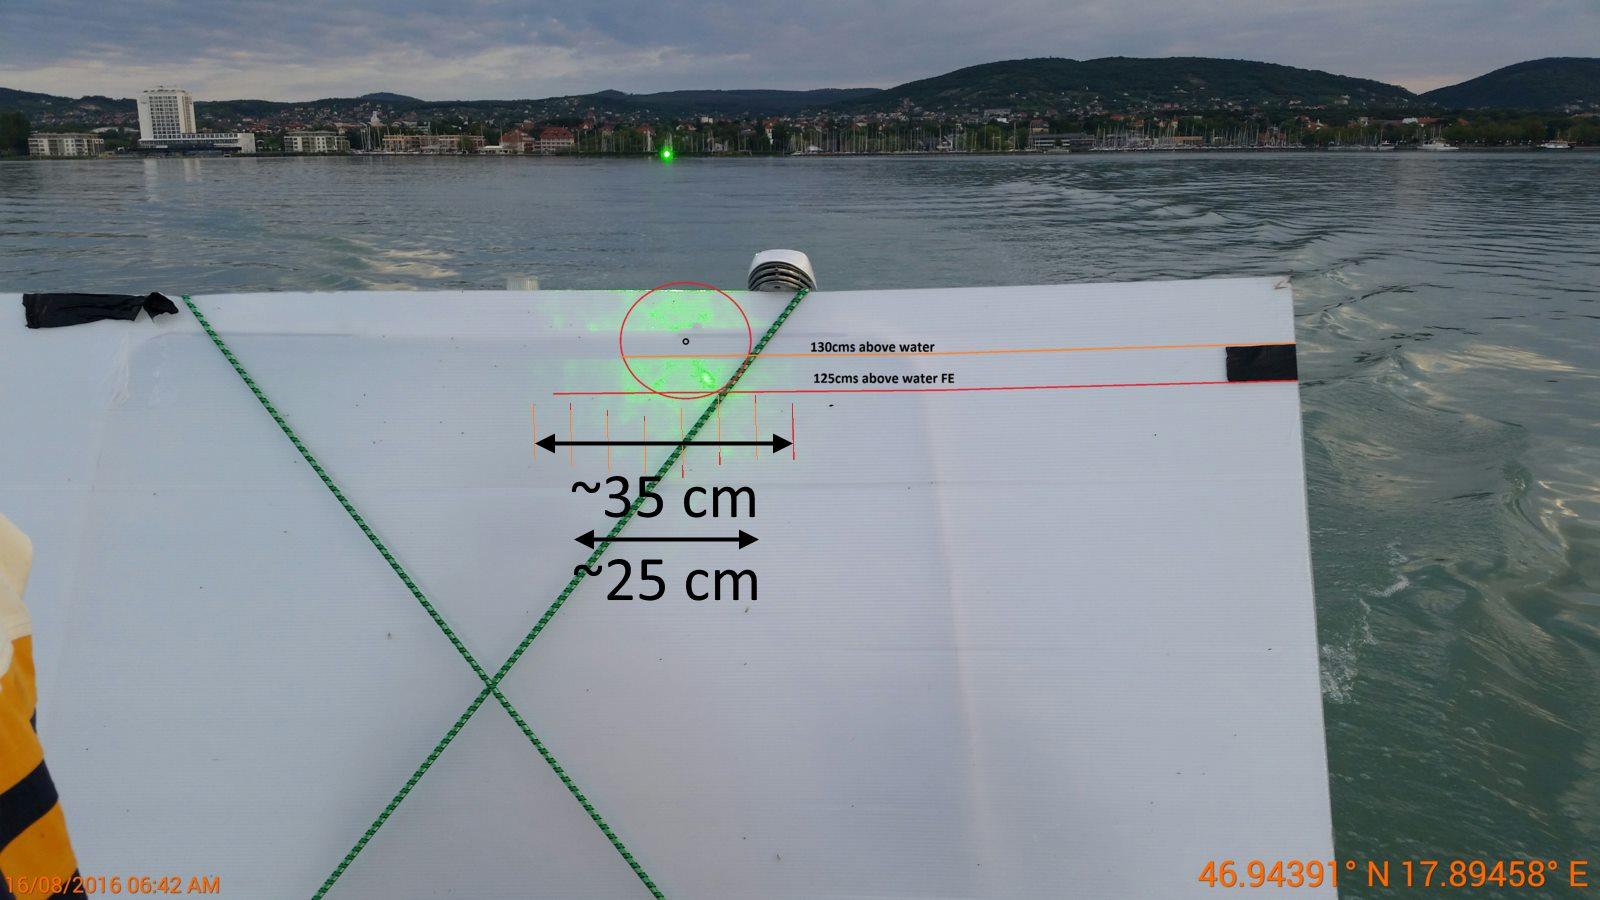 20160816_064208 LEVELING 1-spread-25cm.